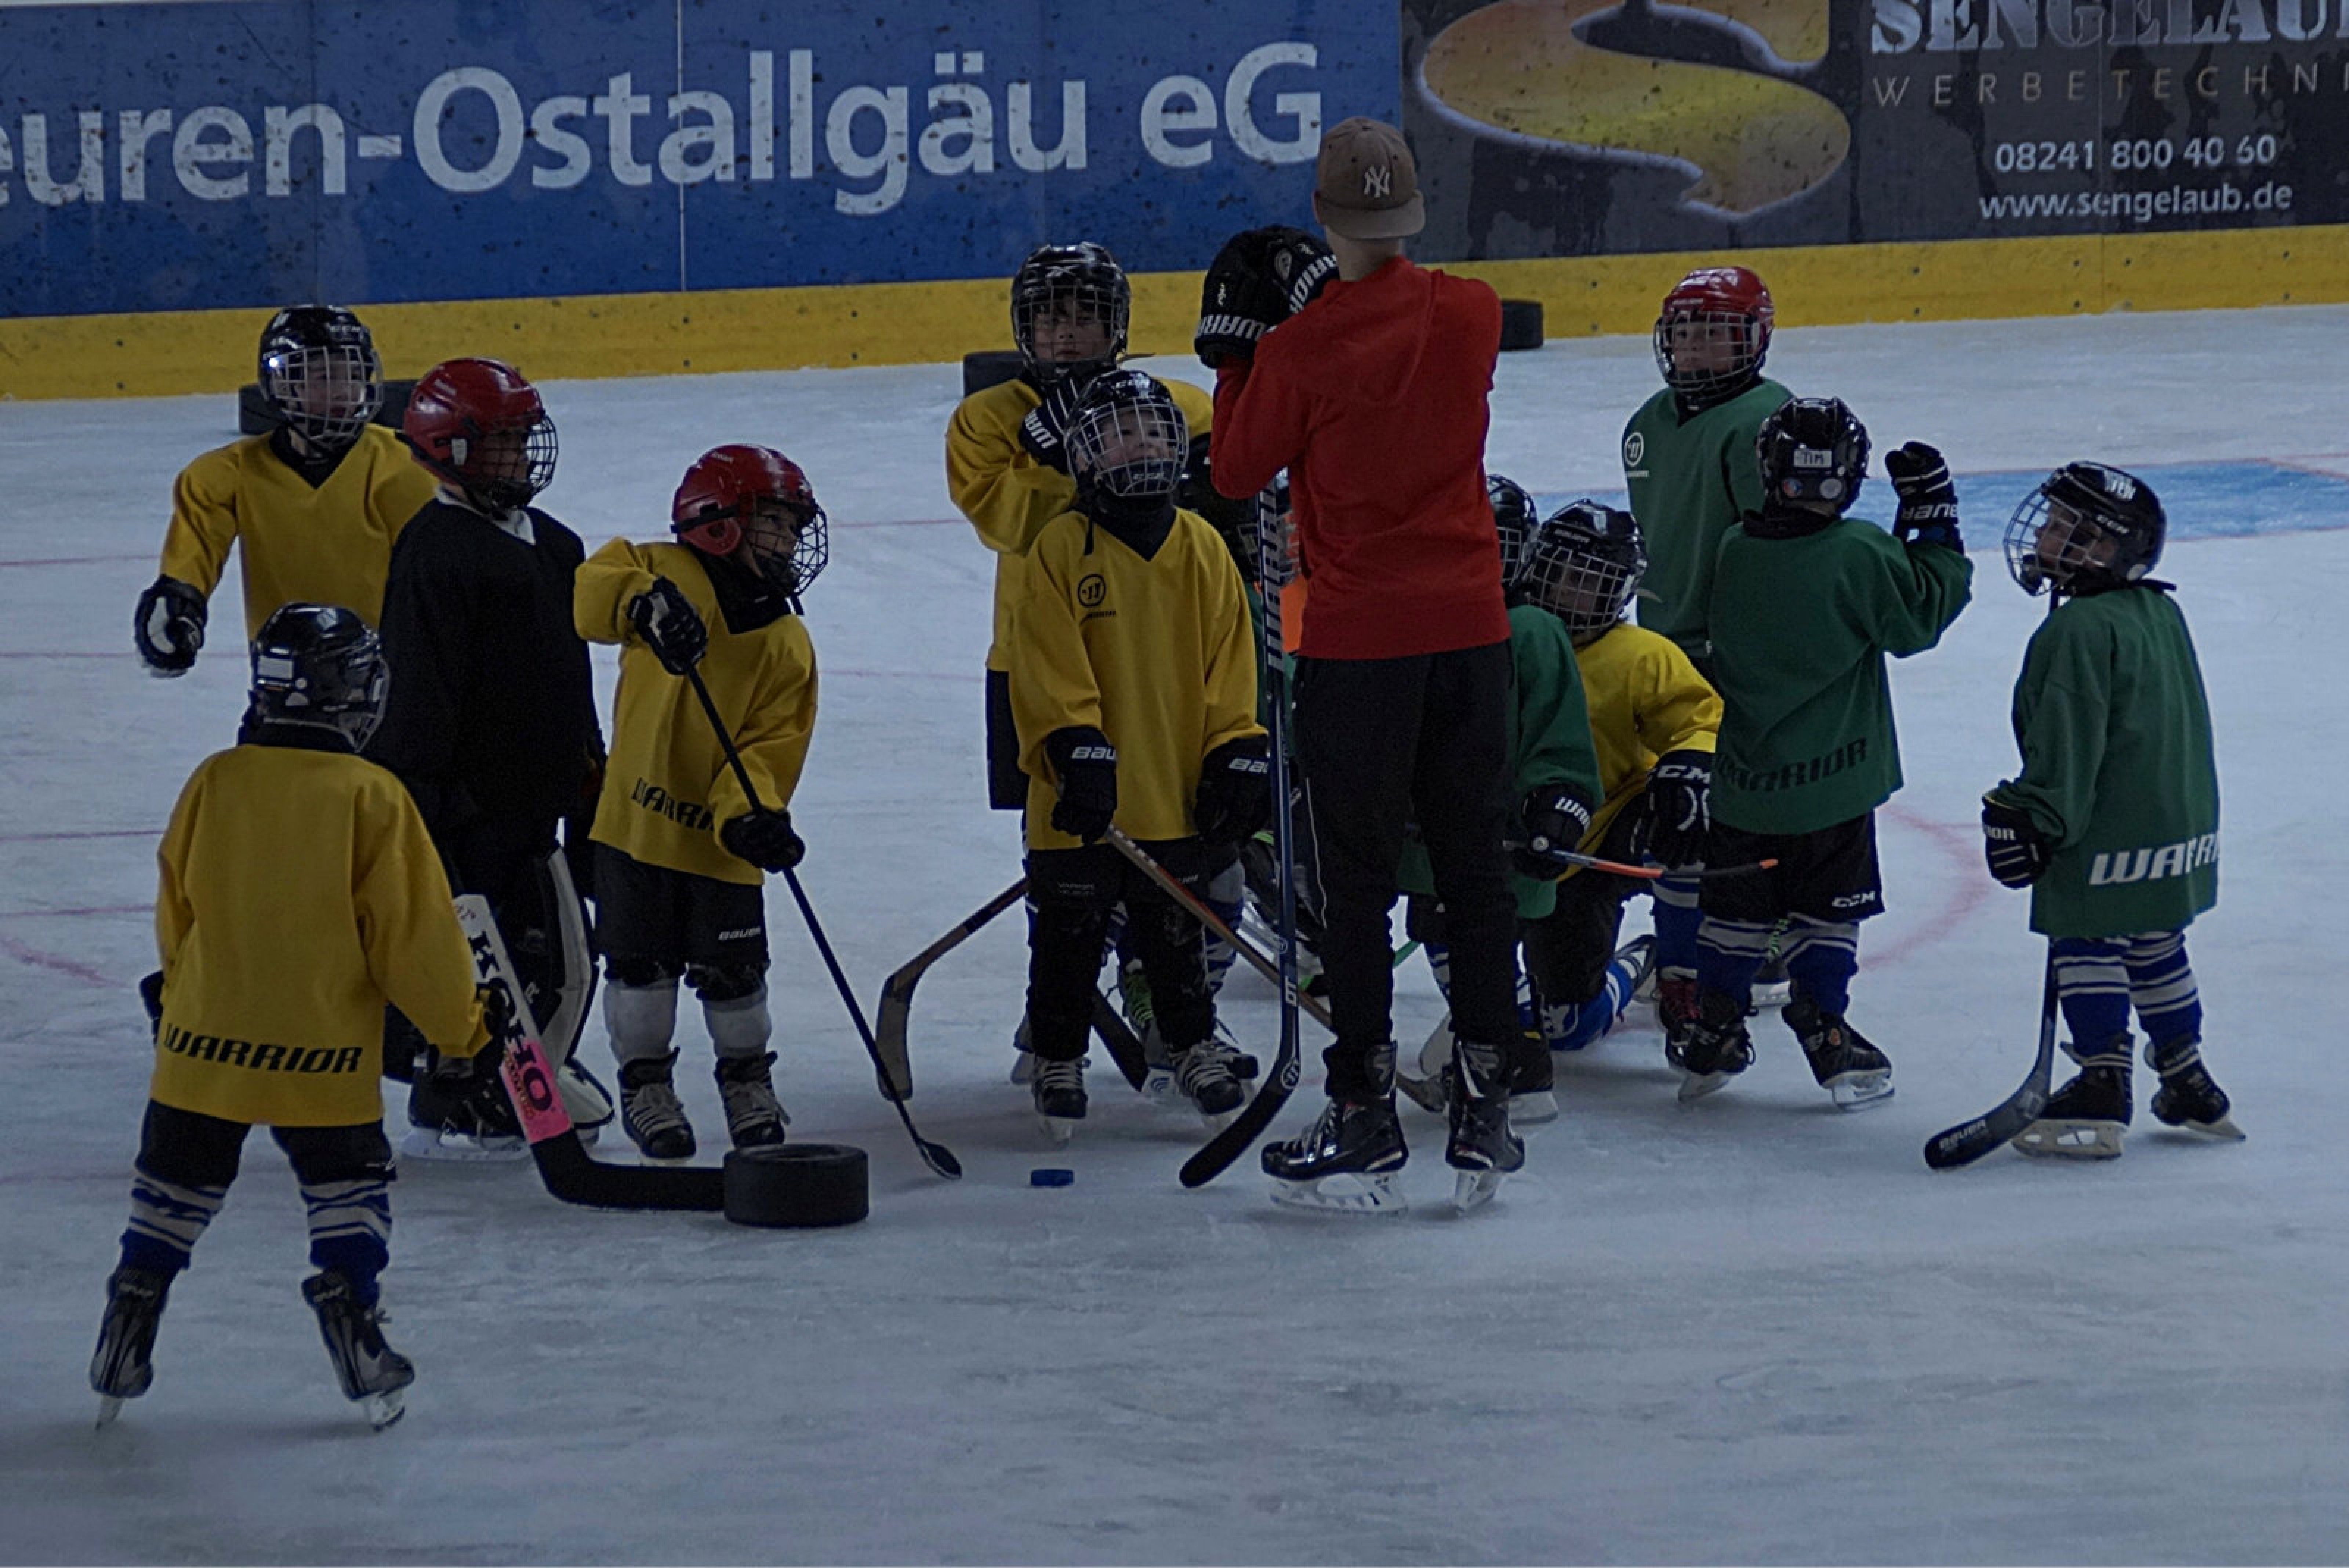 Kids on Ice Day 15.09 (2)